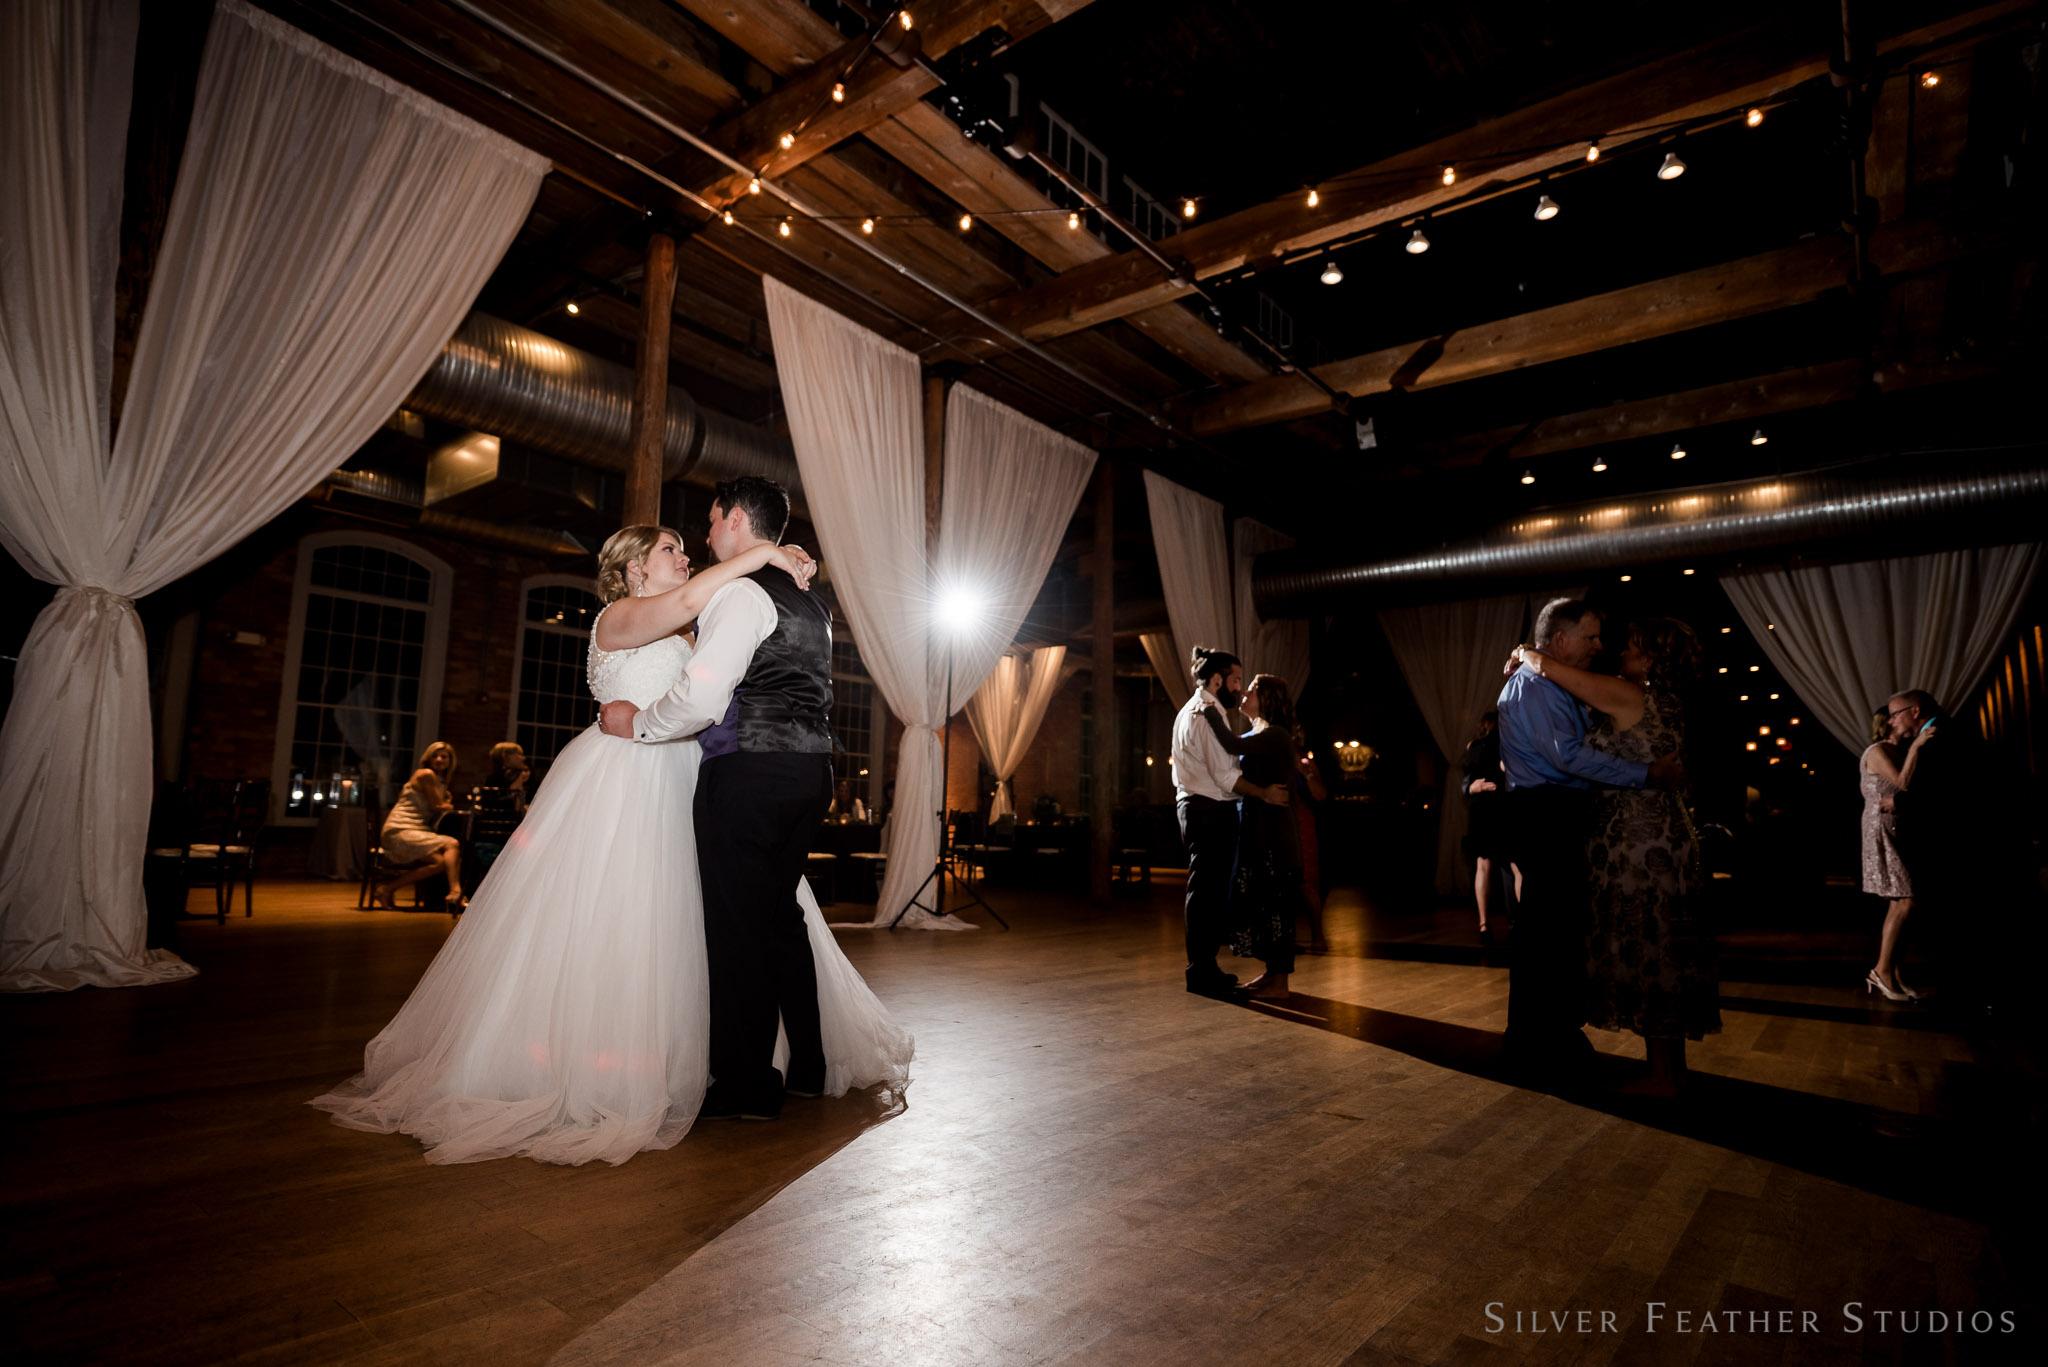 cottom-room-wedding-photography-052.jpg